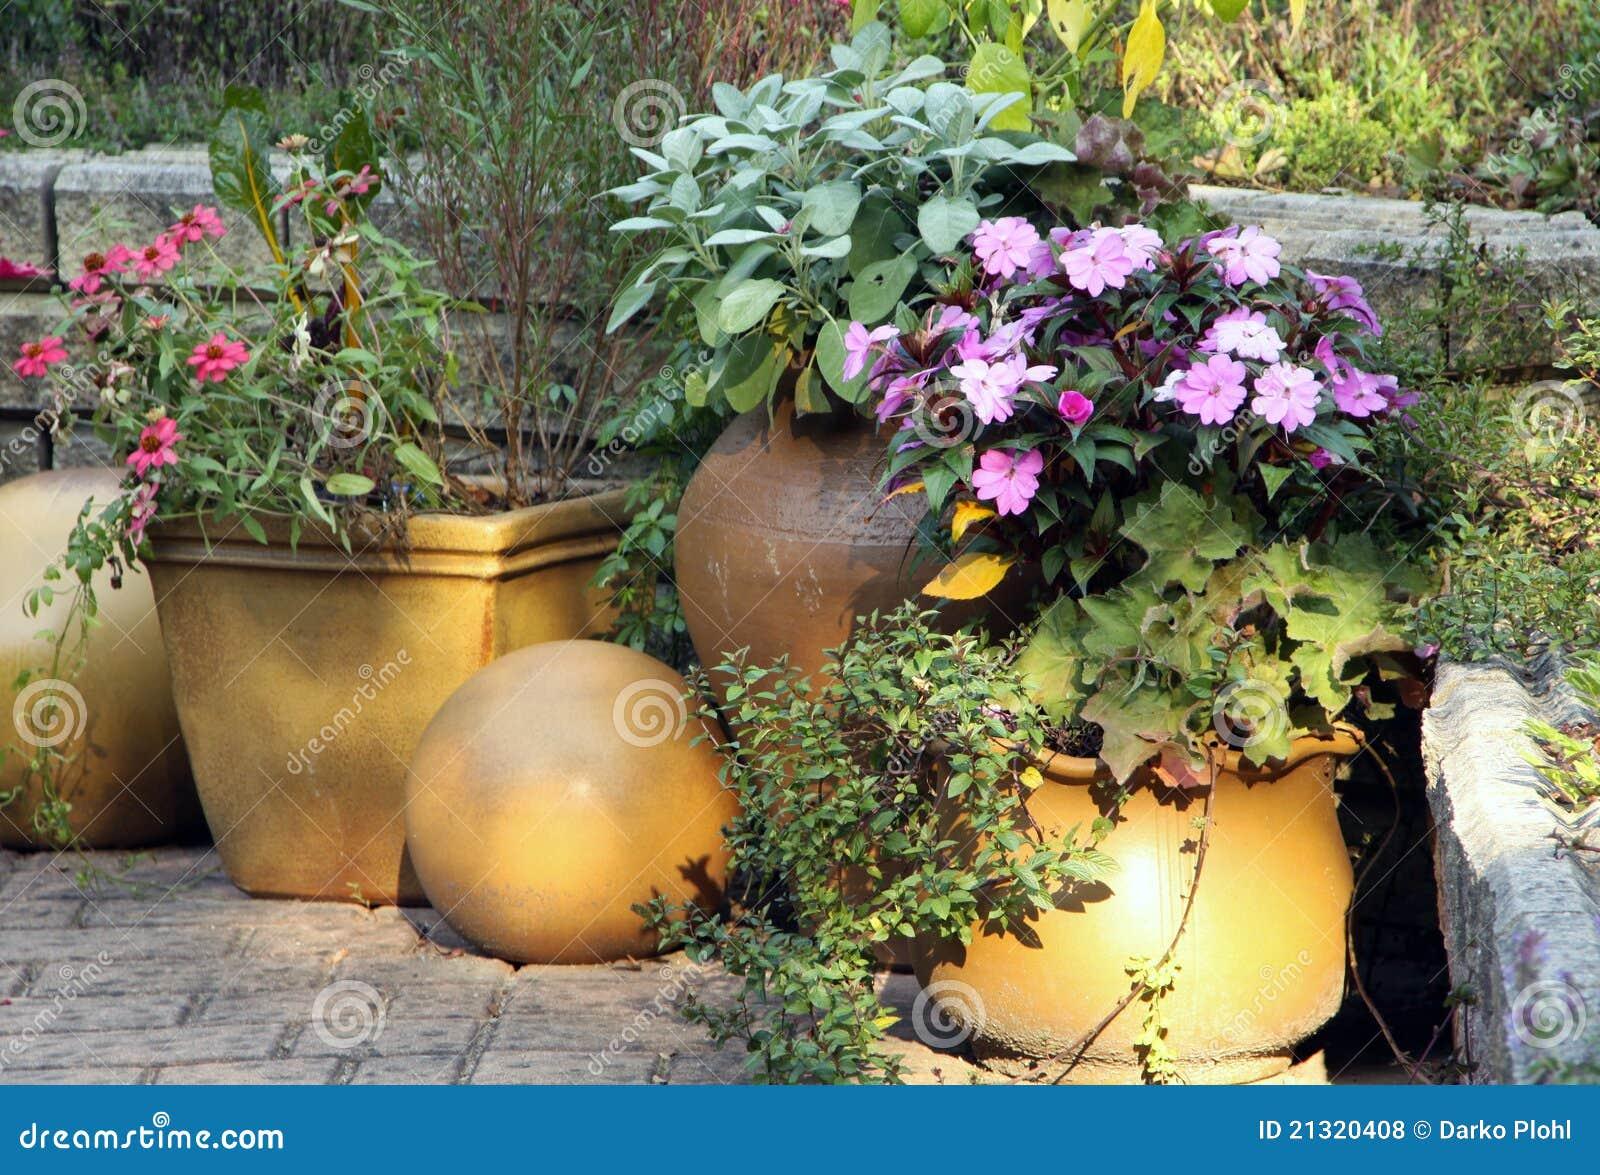 Terrace garden with pot plants royalty free stock photos for Terrace garden plants